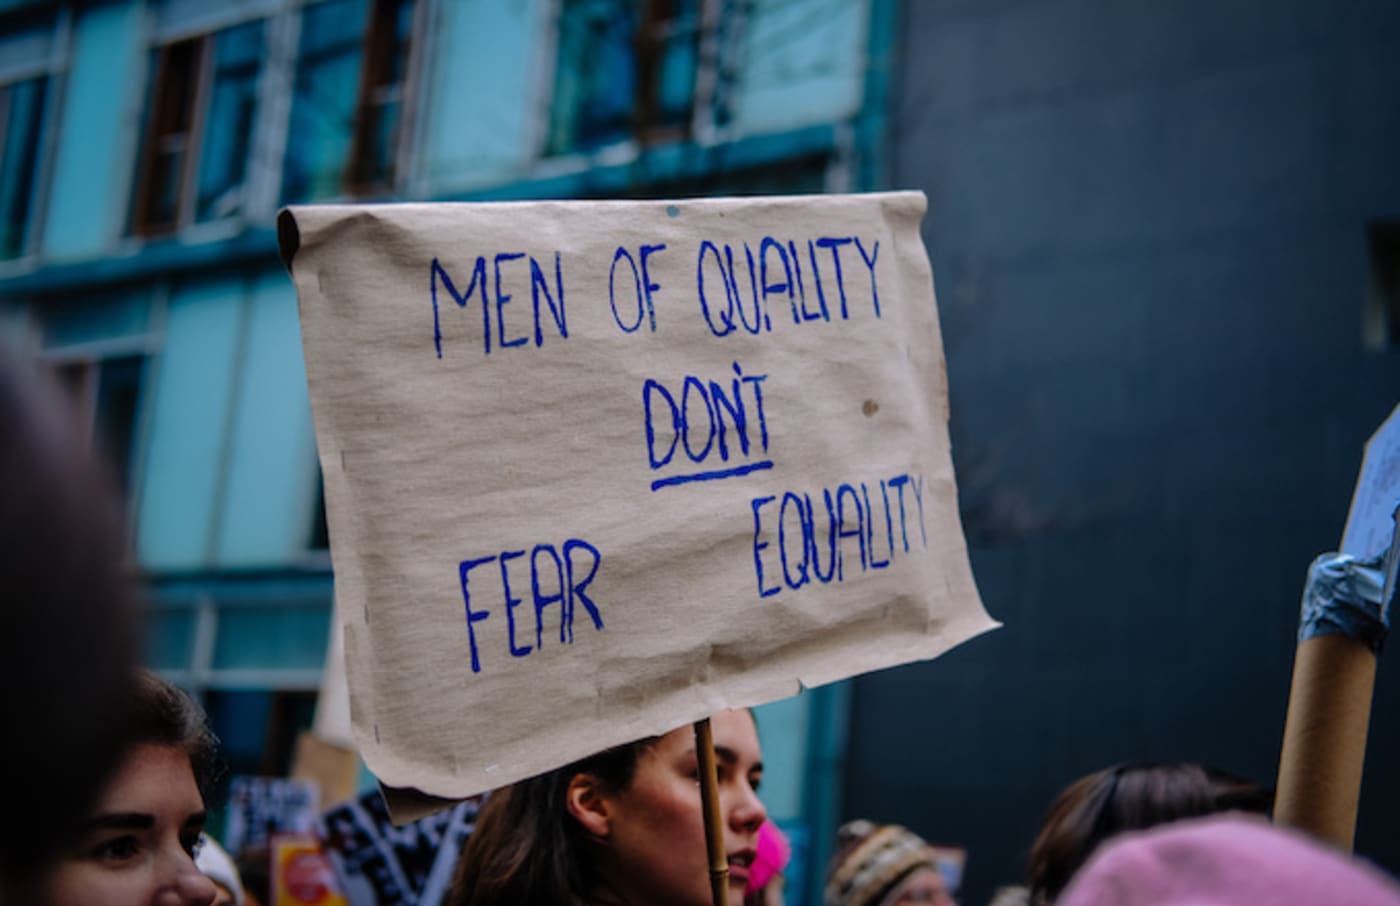 Feminist protest sign